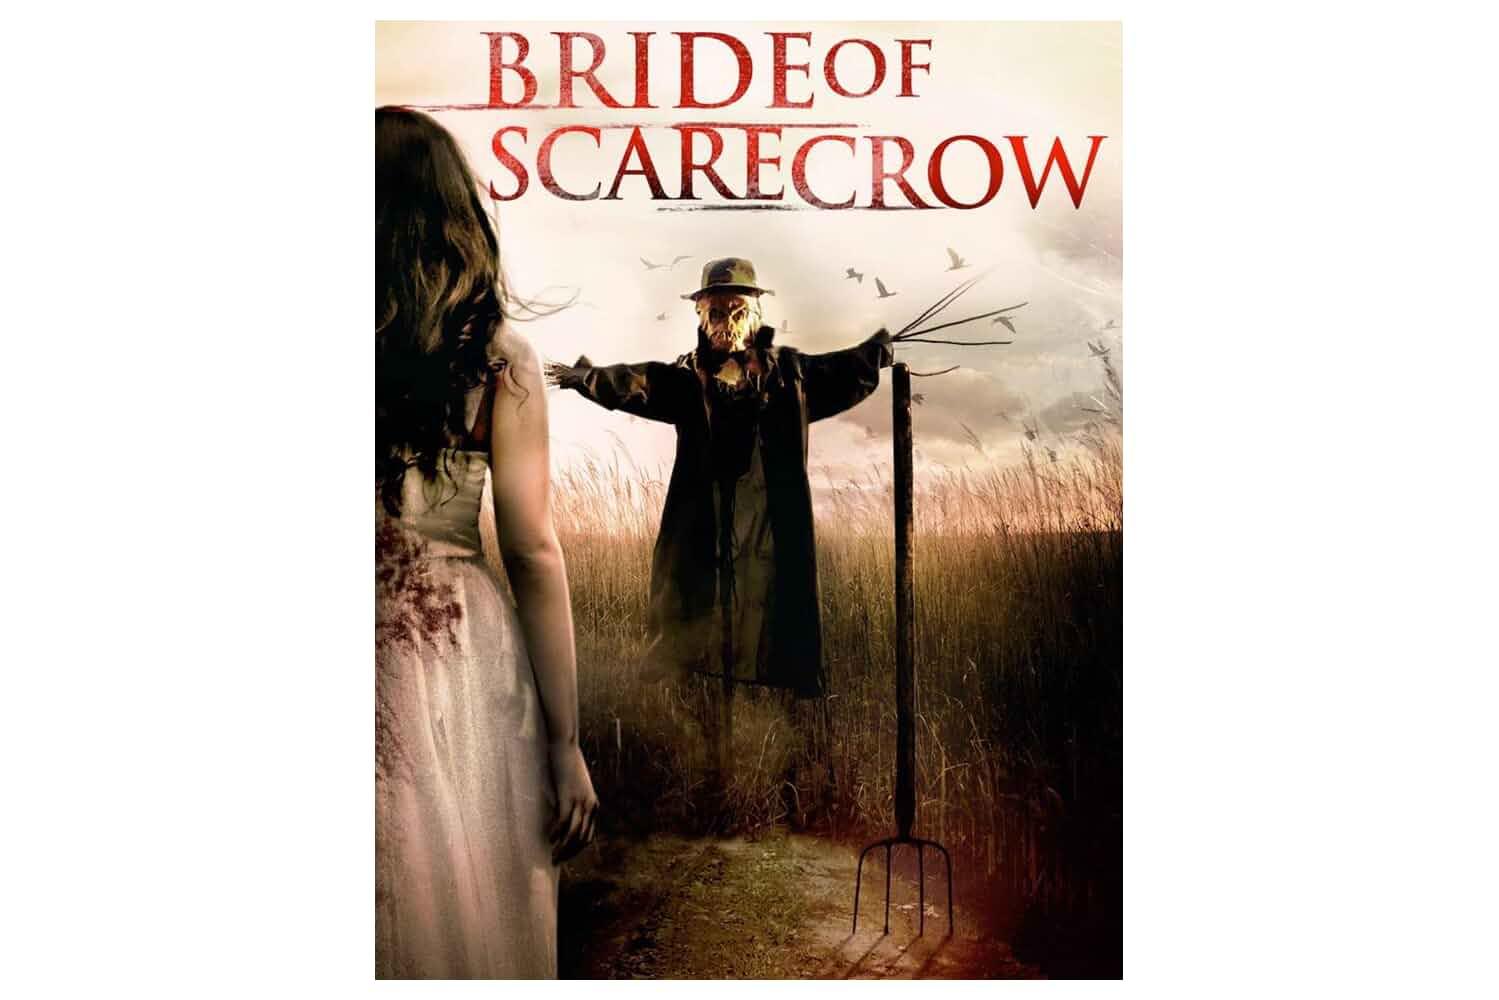 Bride of Scarecrow (2018)